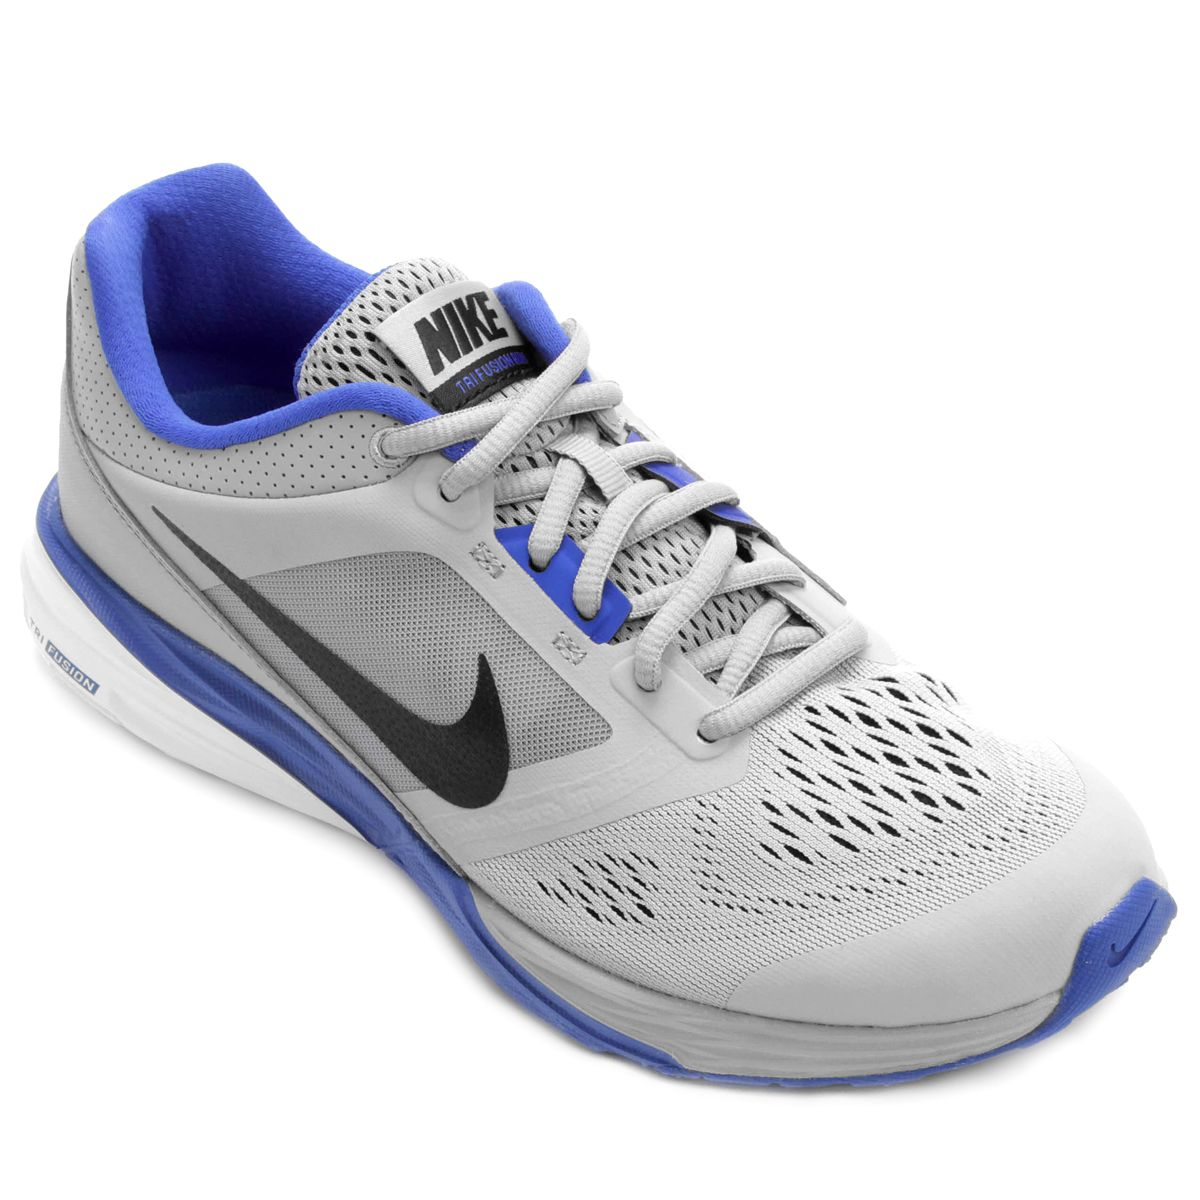 0050c1beec Tênis Nike Tri Fusion Run MSL Masculino - Azul e Cinza